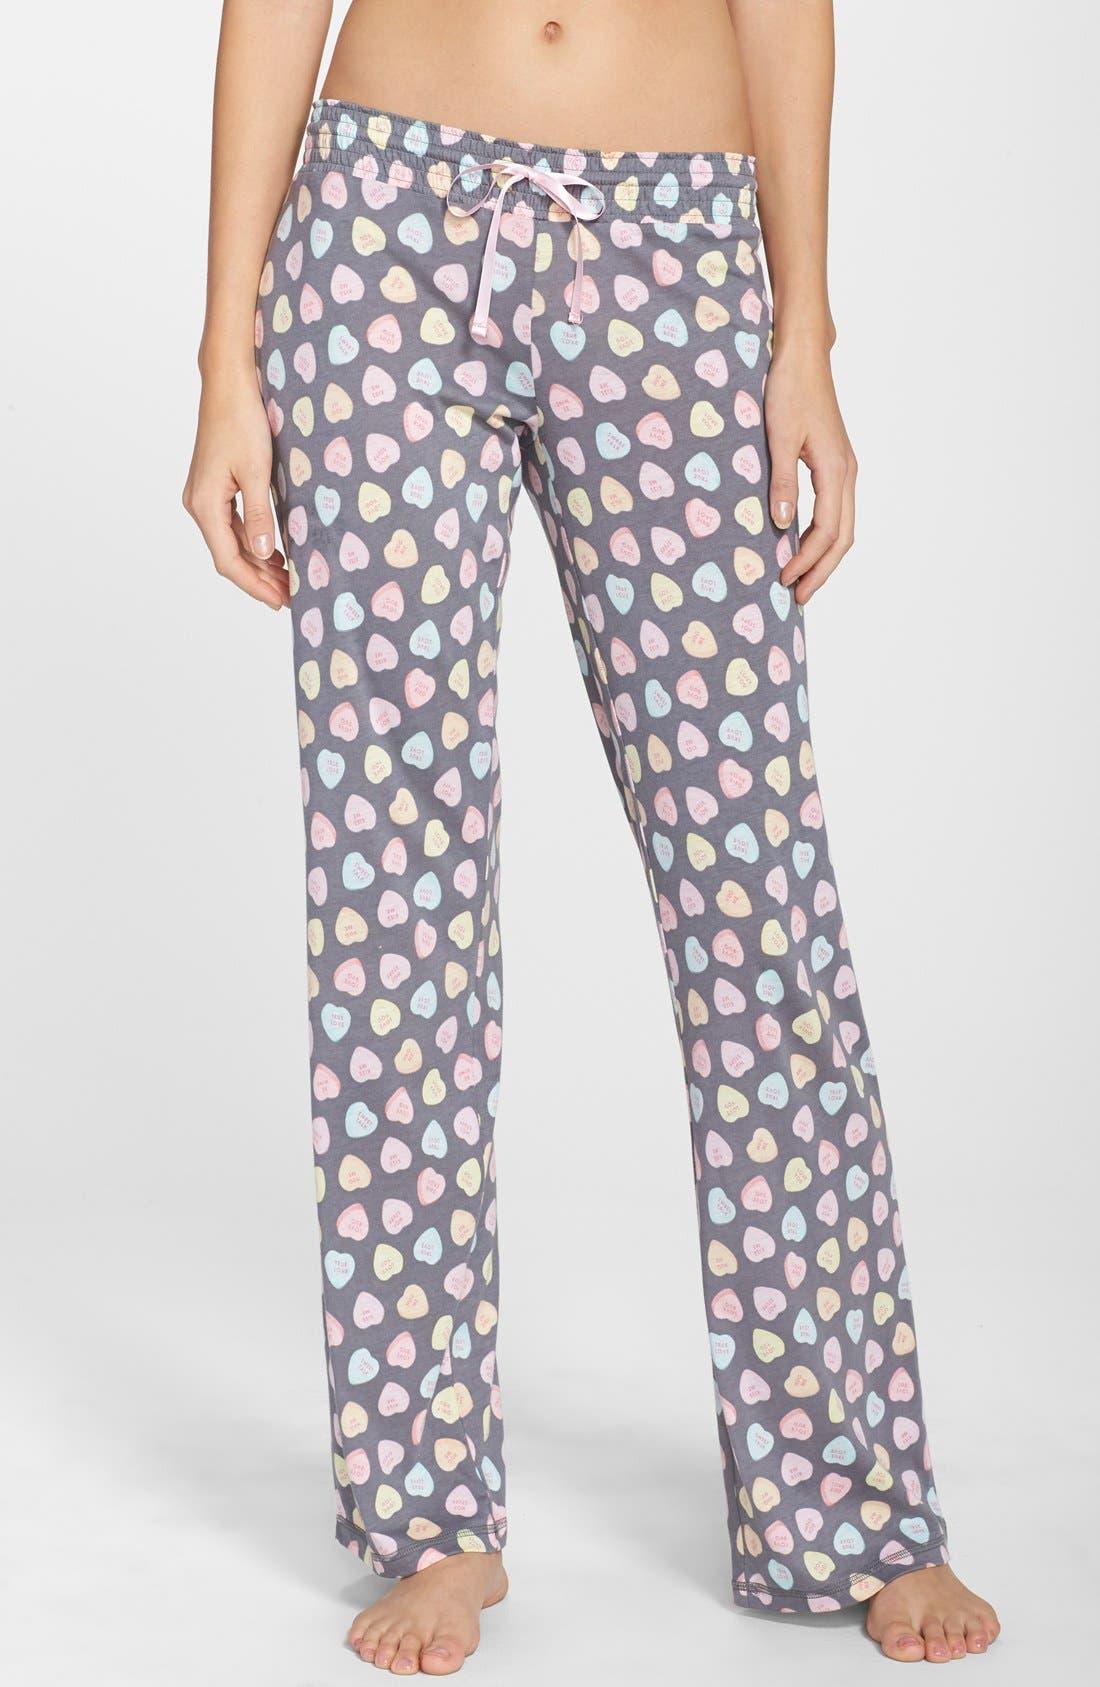 PJ SALVAGE 'Candy Hearts' Pajama Pants, Main, color, 020